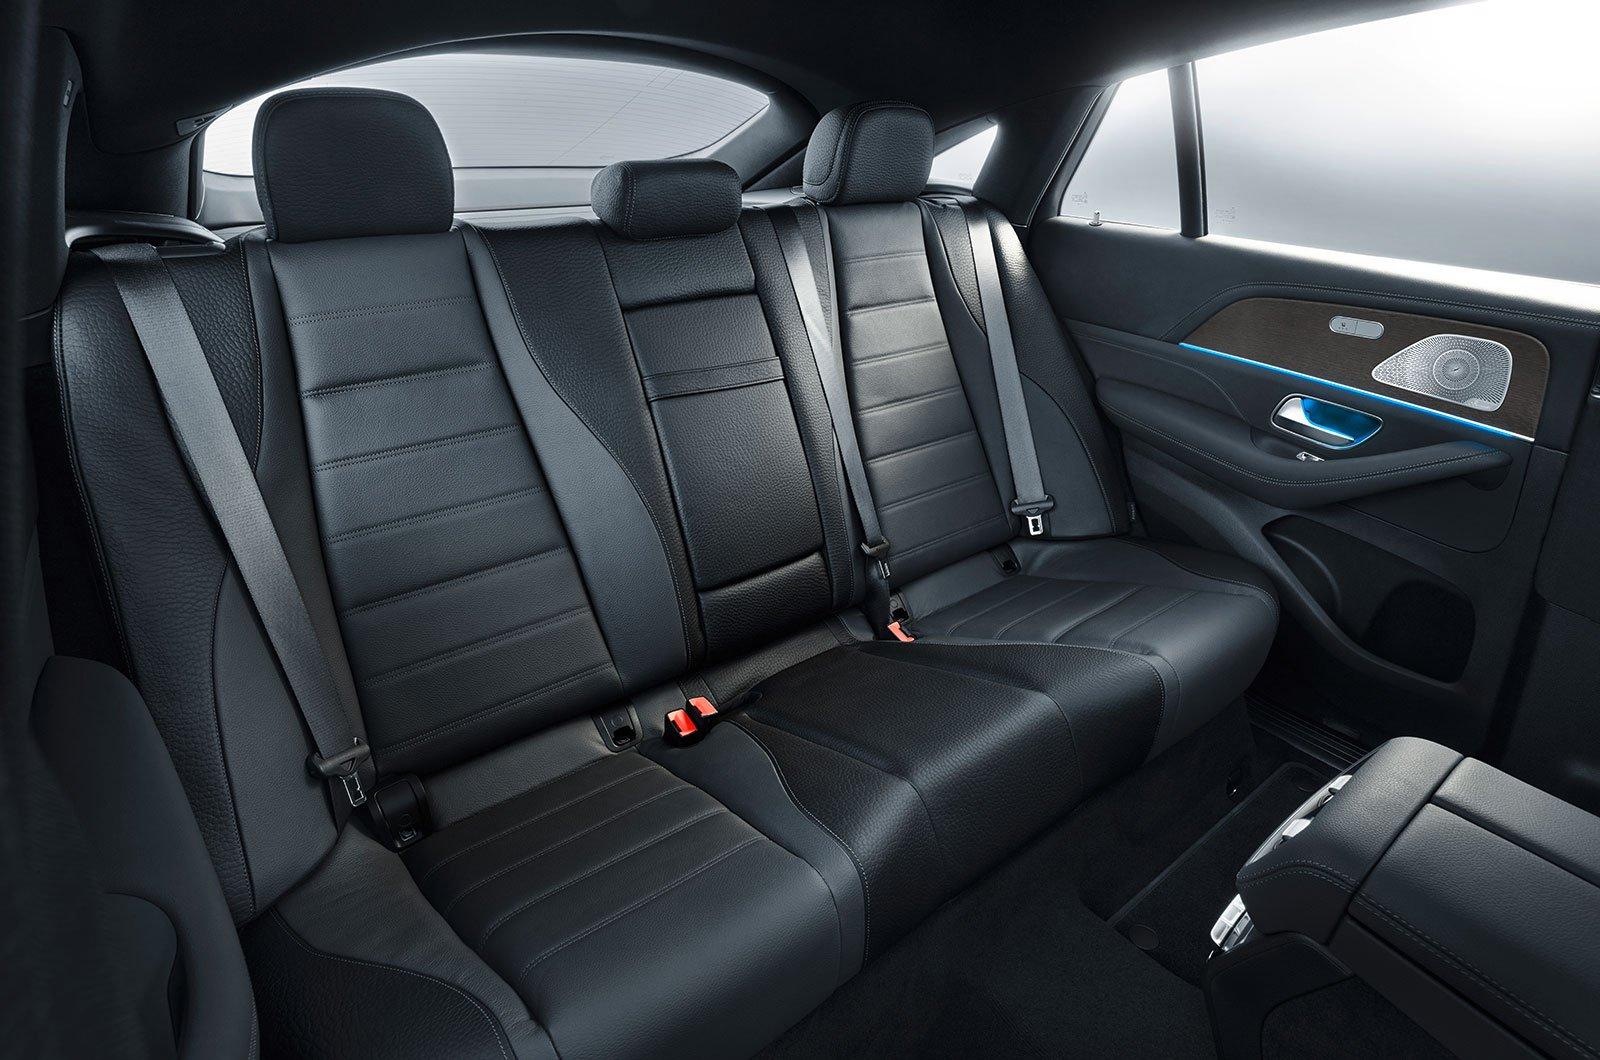 Mercedes GLE Coupé rear seats